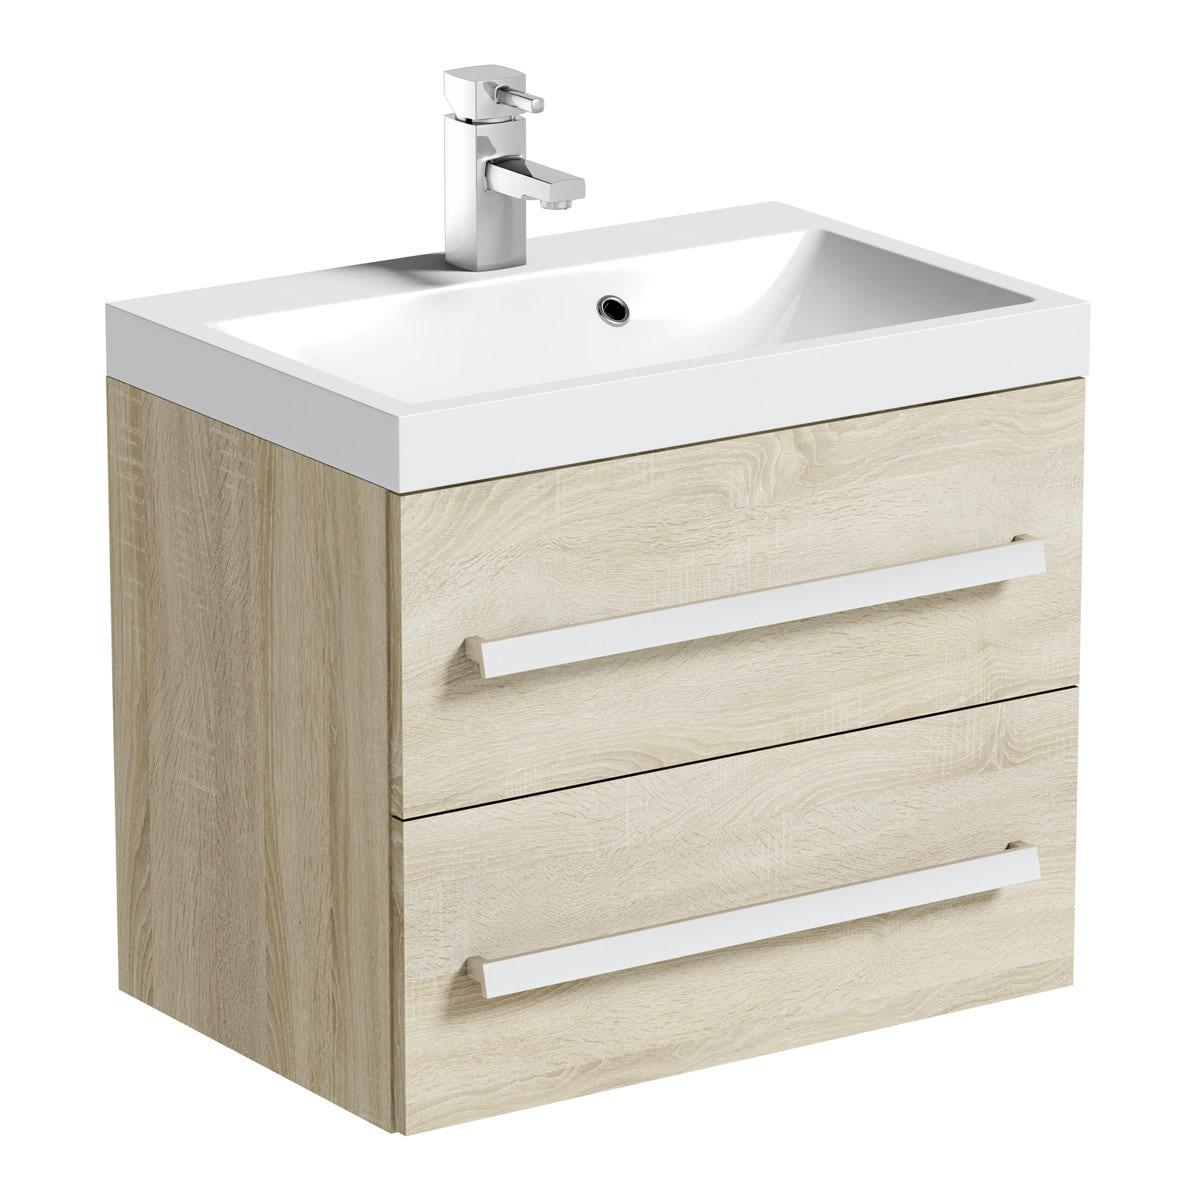 Wye oak 600 wall hung vanity unit with basin